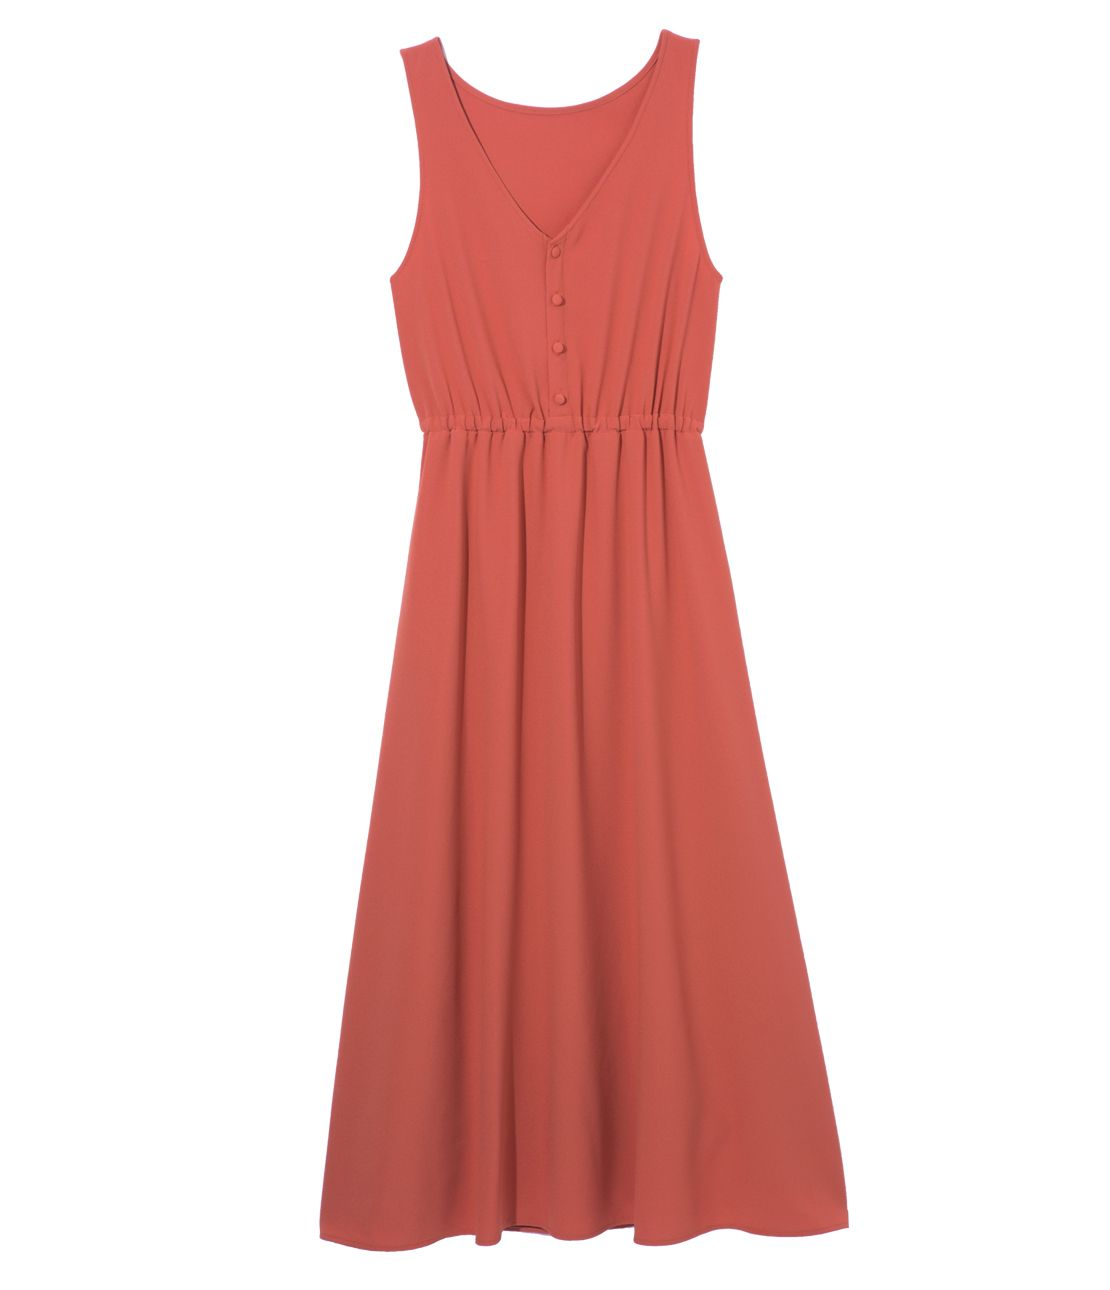 2WAY sleeveless long dress